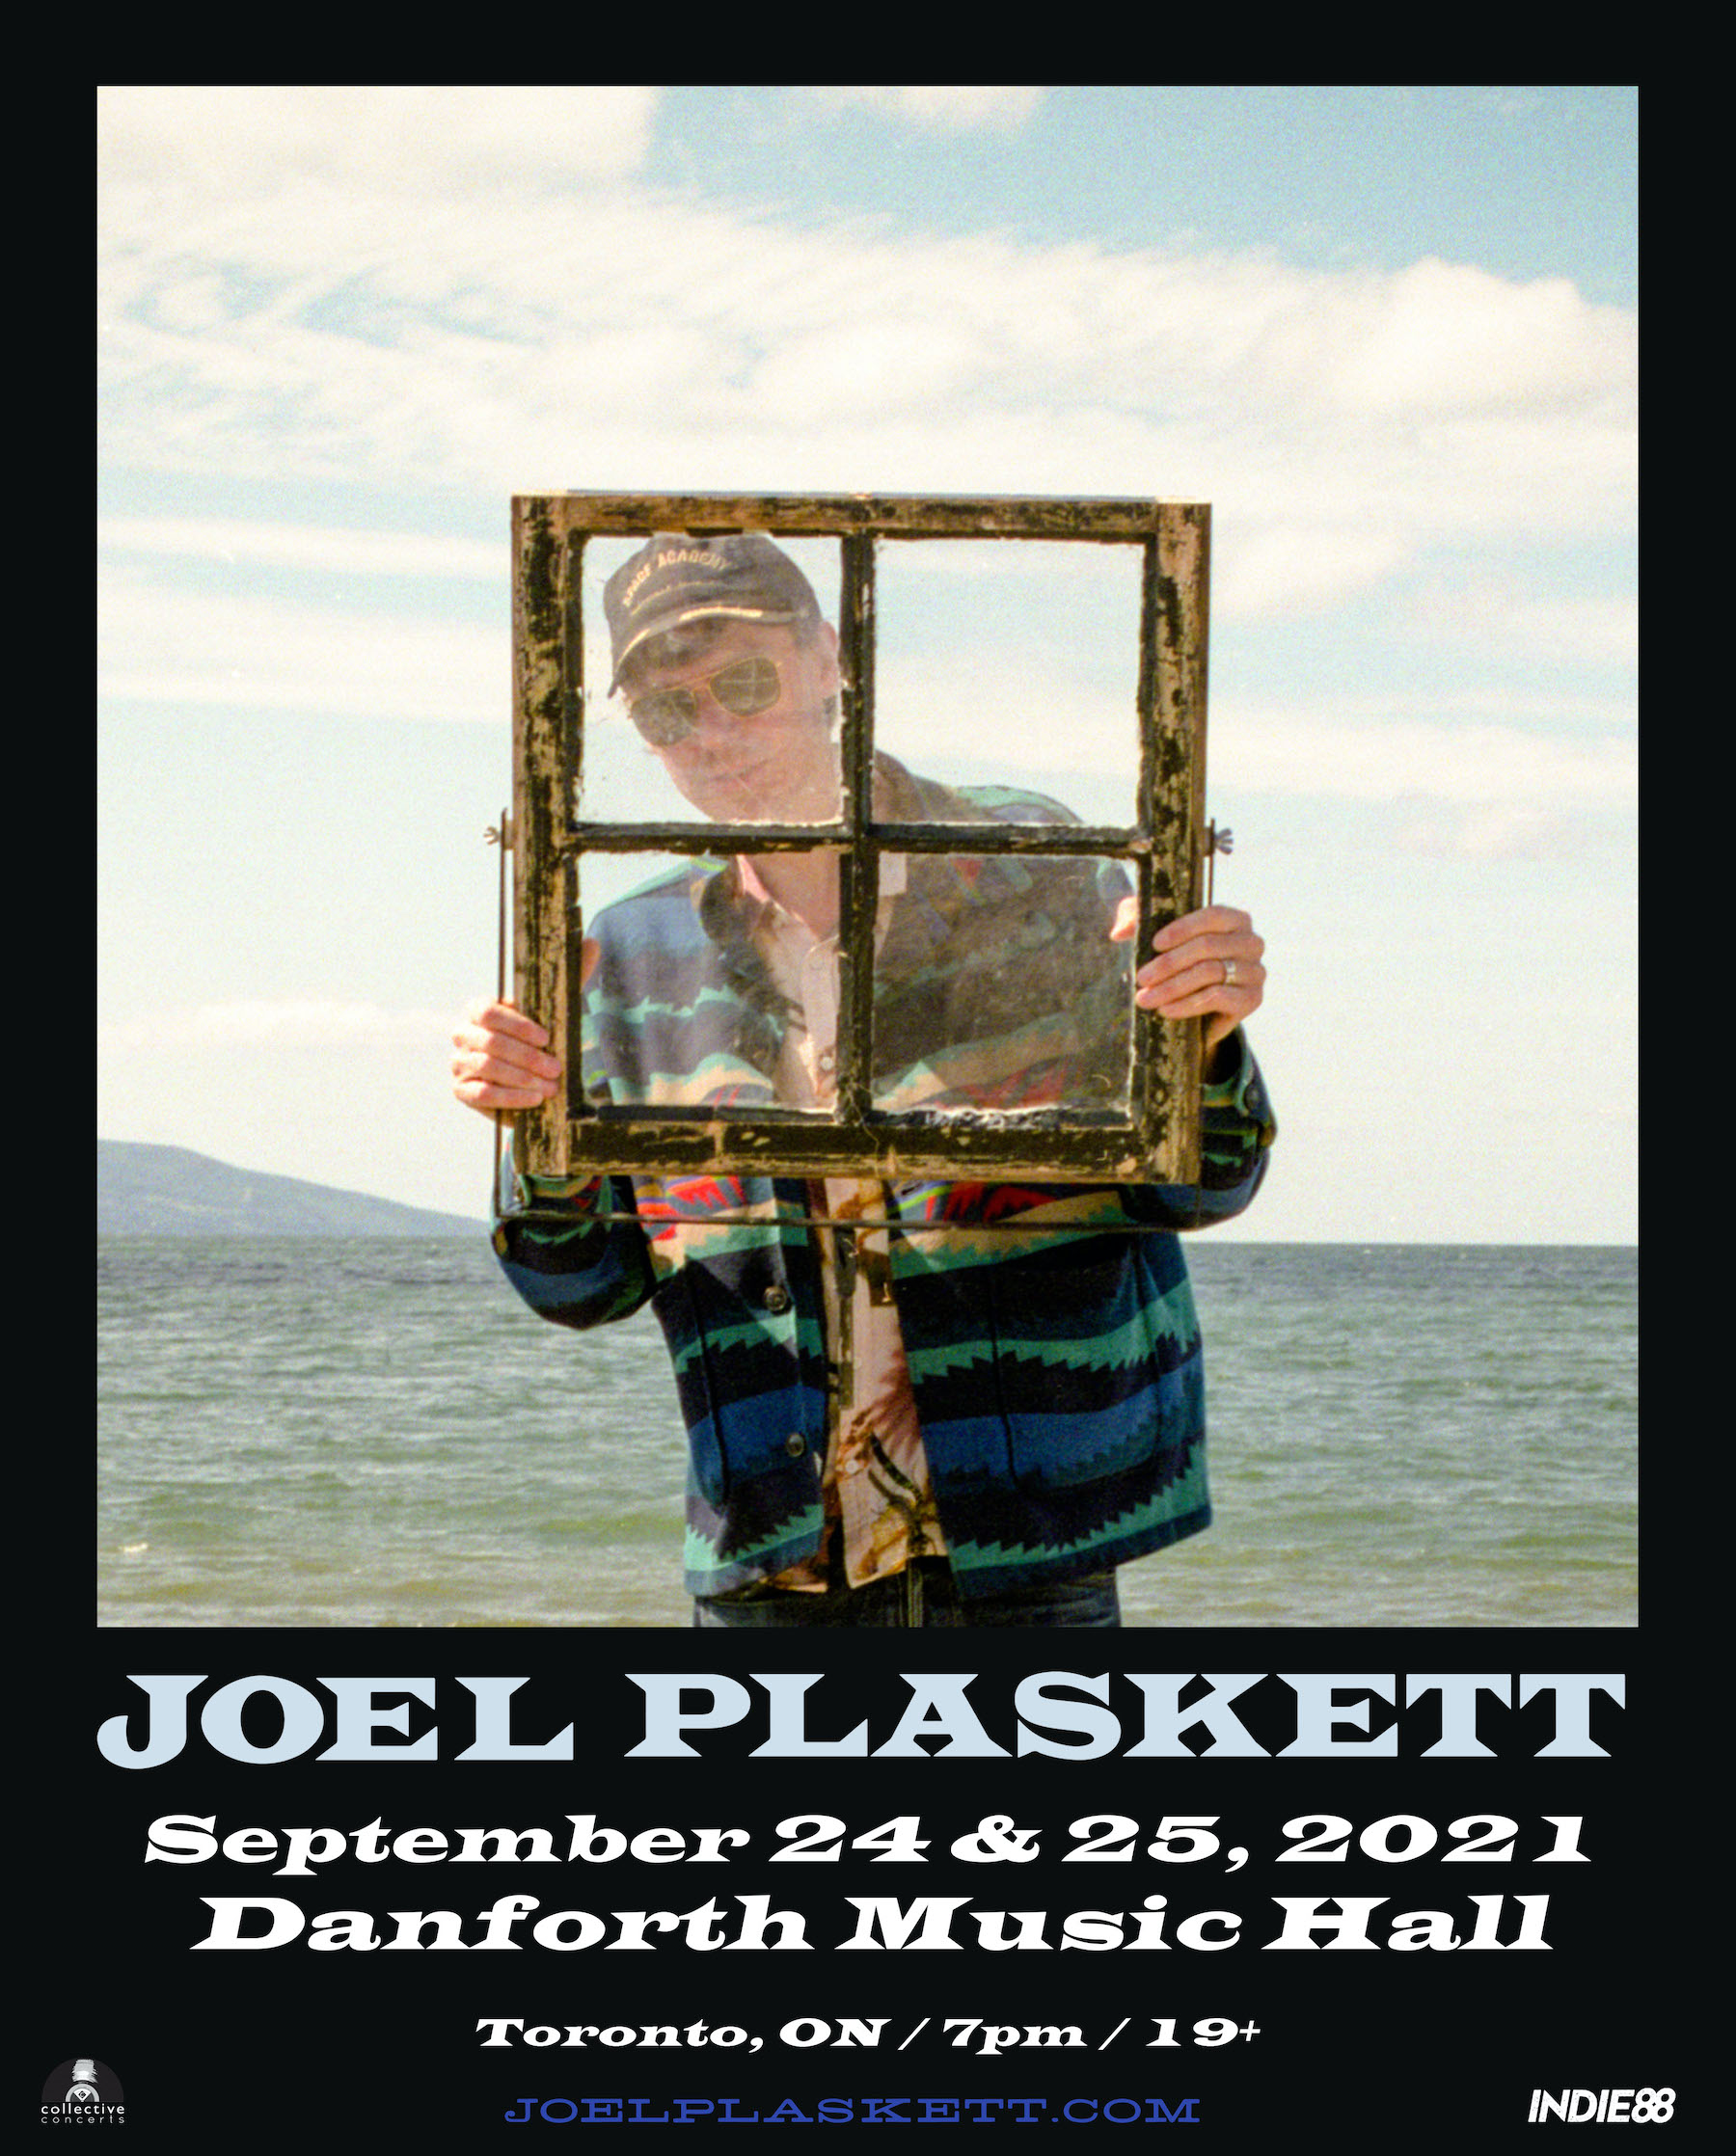 CANCELLED - Joel Plaskett